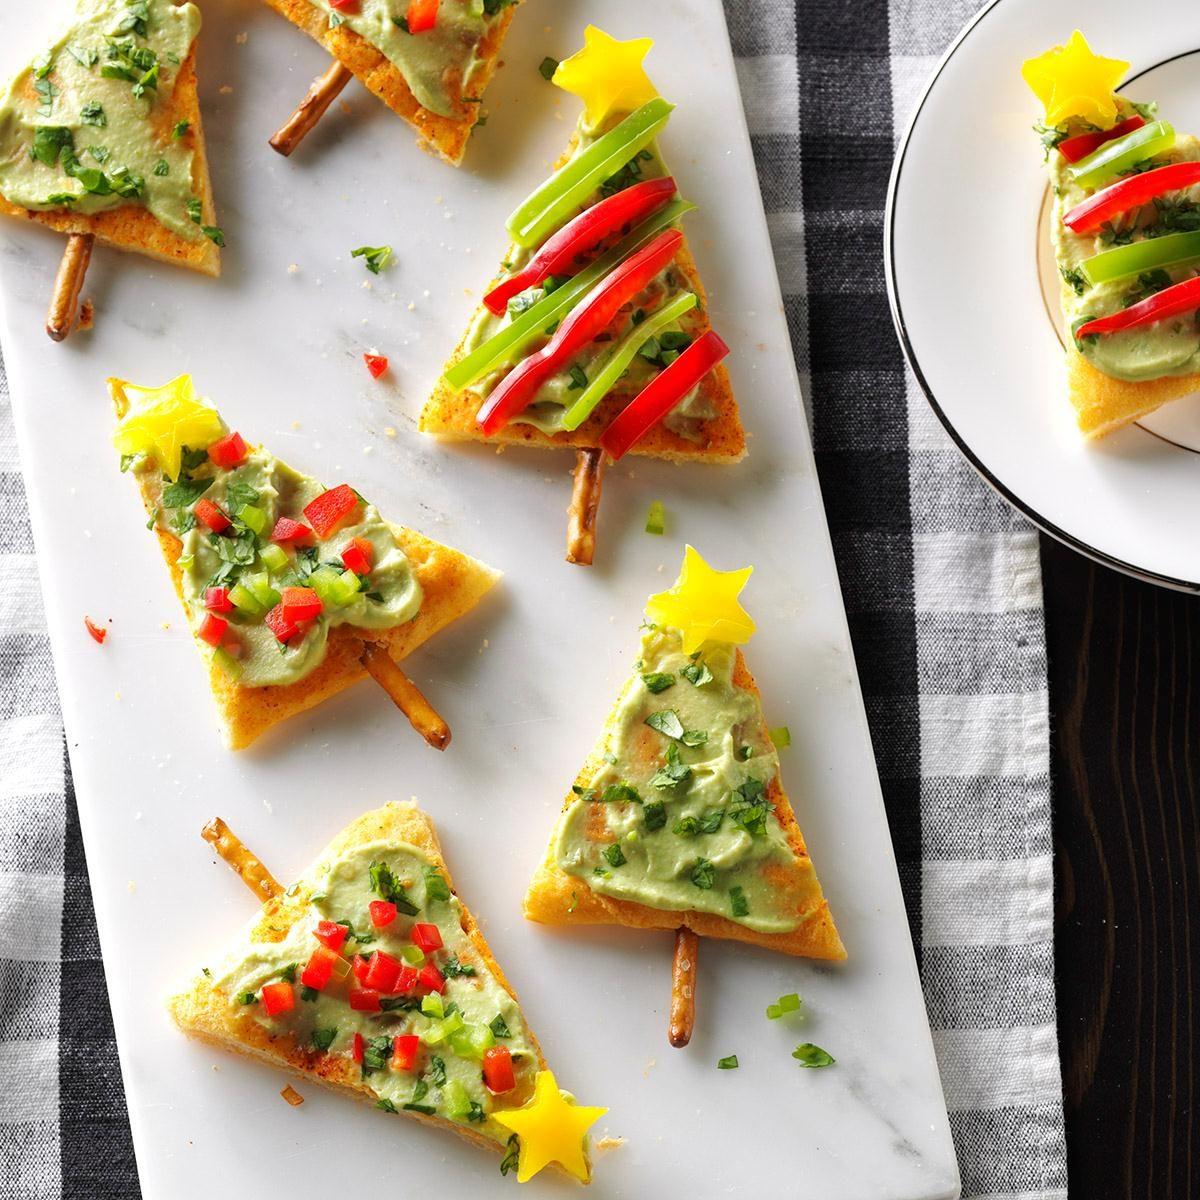 Festive Guacamole Appetizers Recipe Taste Of Home,Upper Corner Kitchen Cabinet Storage Ideas